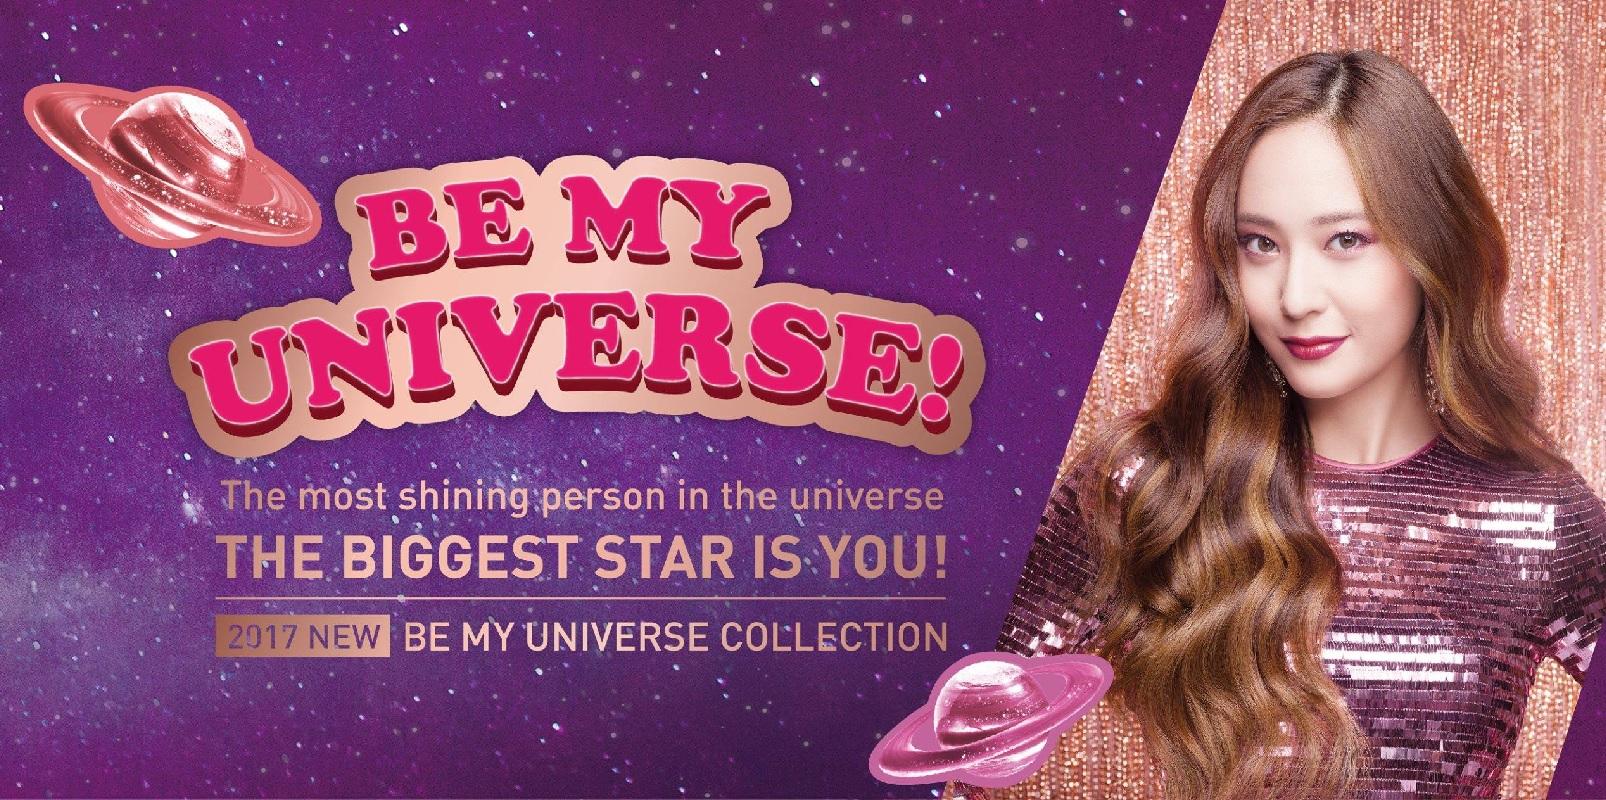 Be My Universe